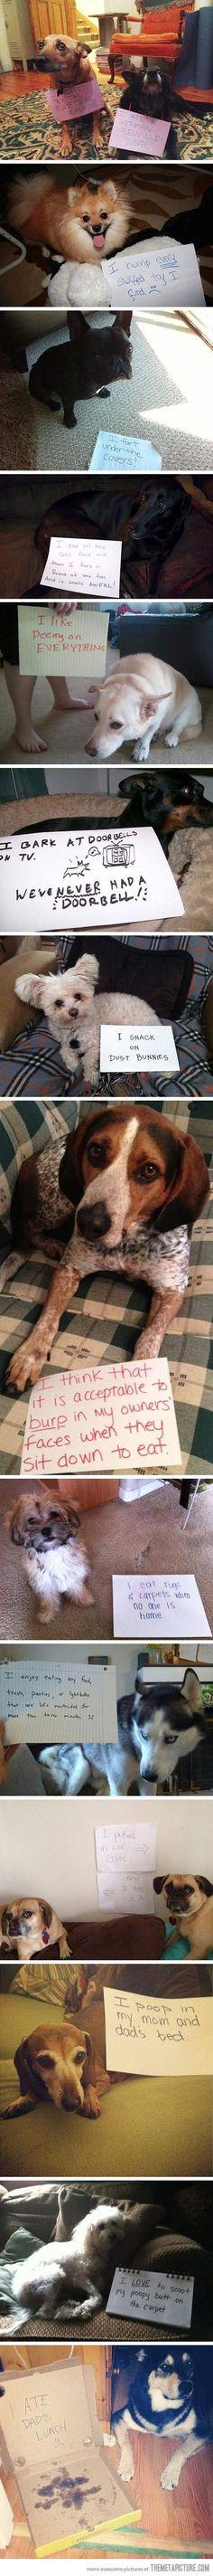 dog shaming - so funny